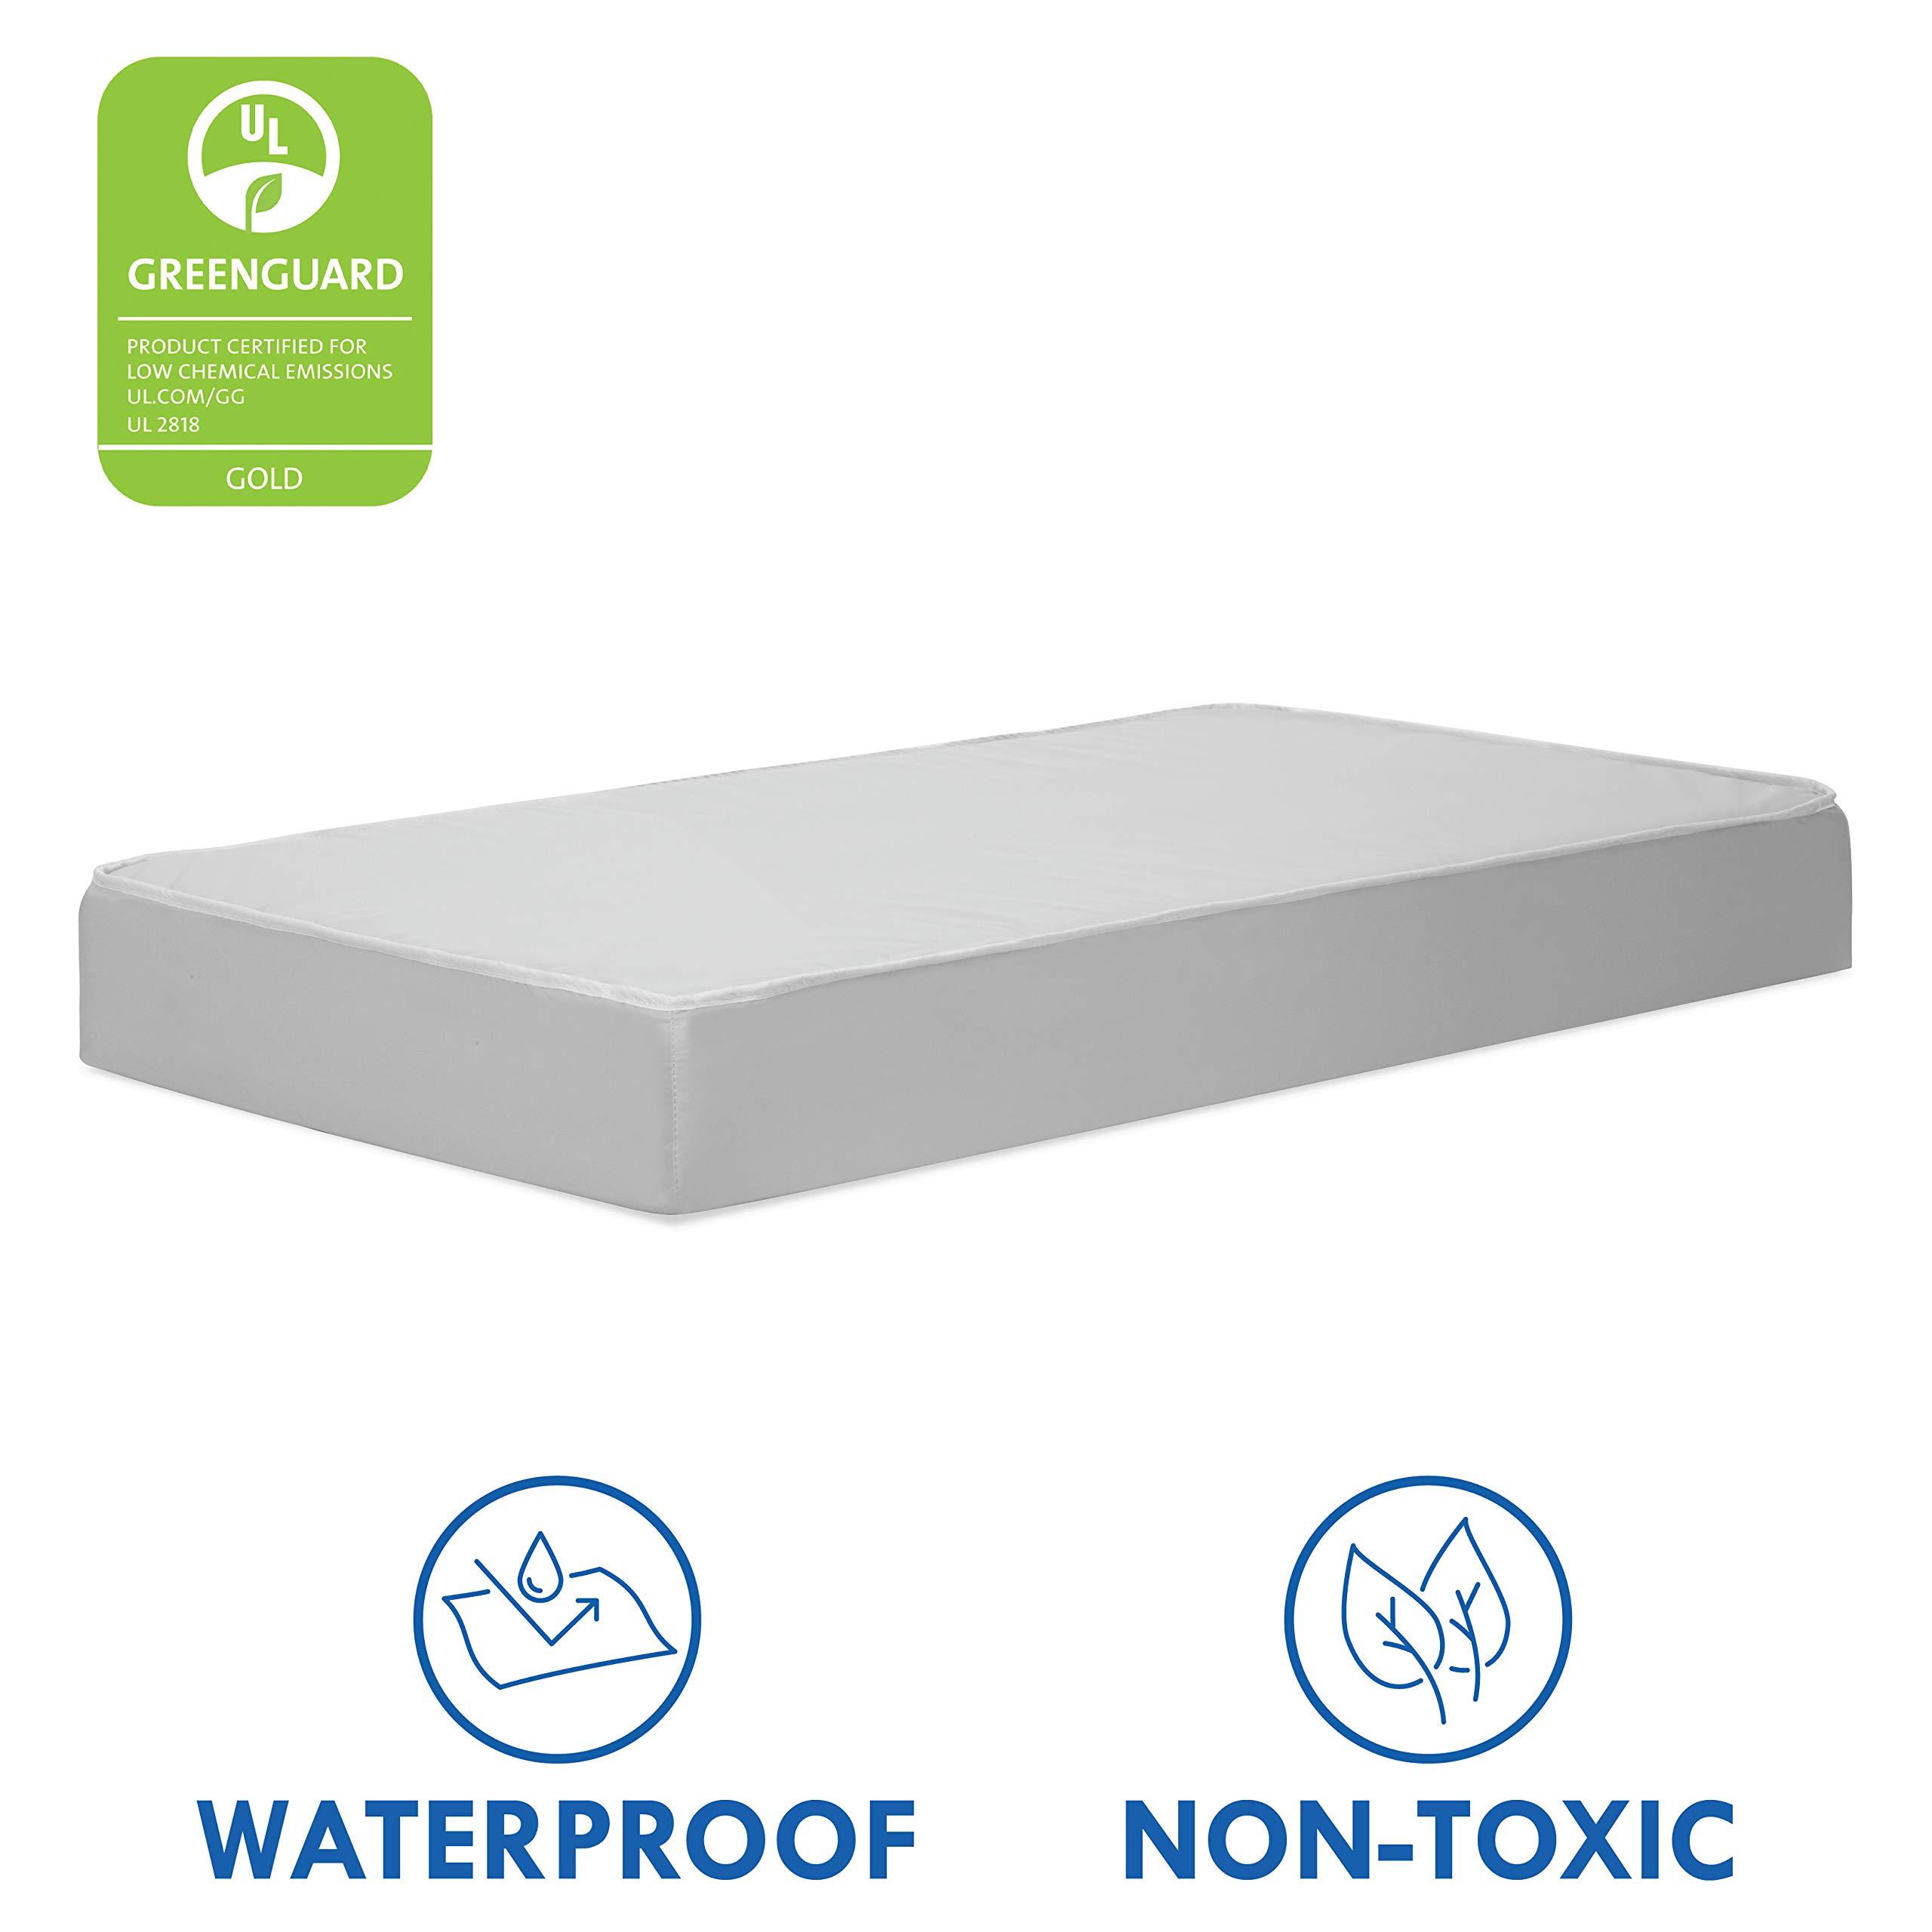 DaVinci Complete Slumber Waterproof Crib & Toddler Mattress | Firm Support | GREENGUARD Gold Certified | Lightweight | 100% Non-Toxic by DaVinci